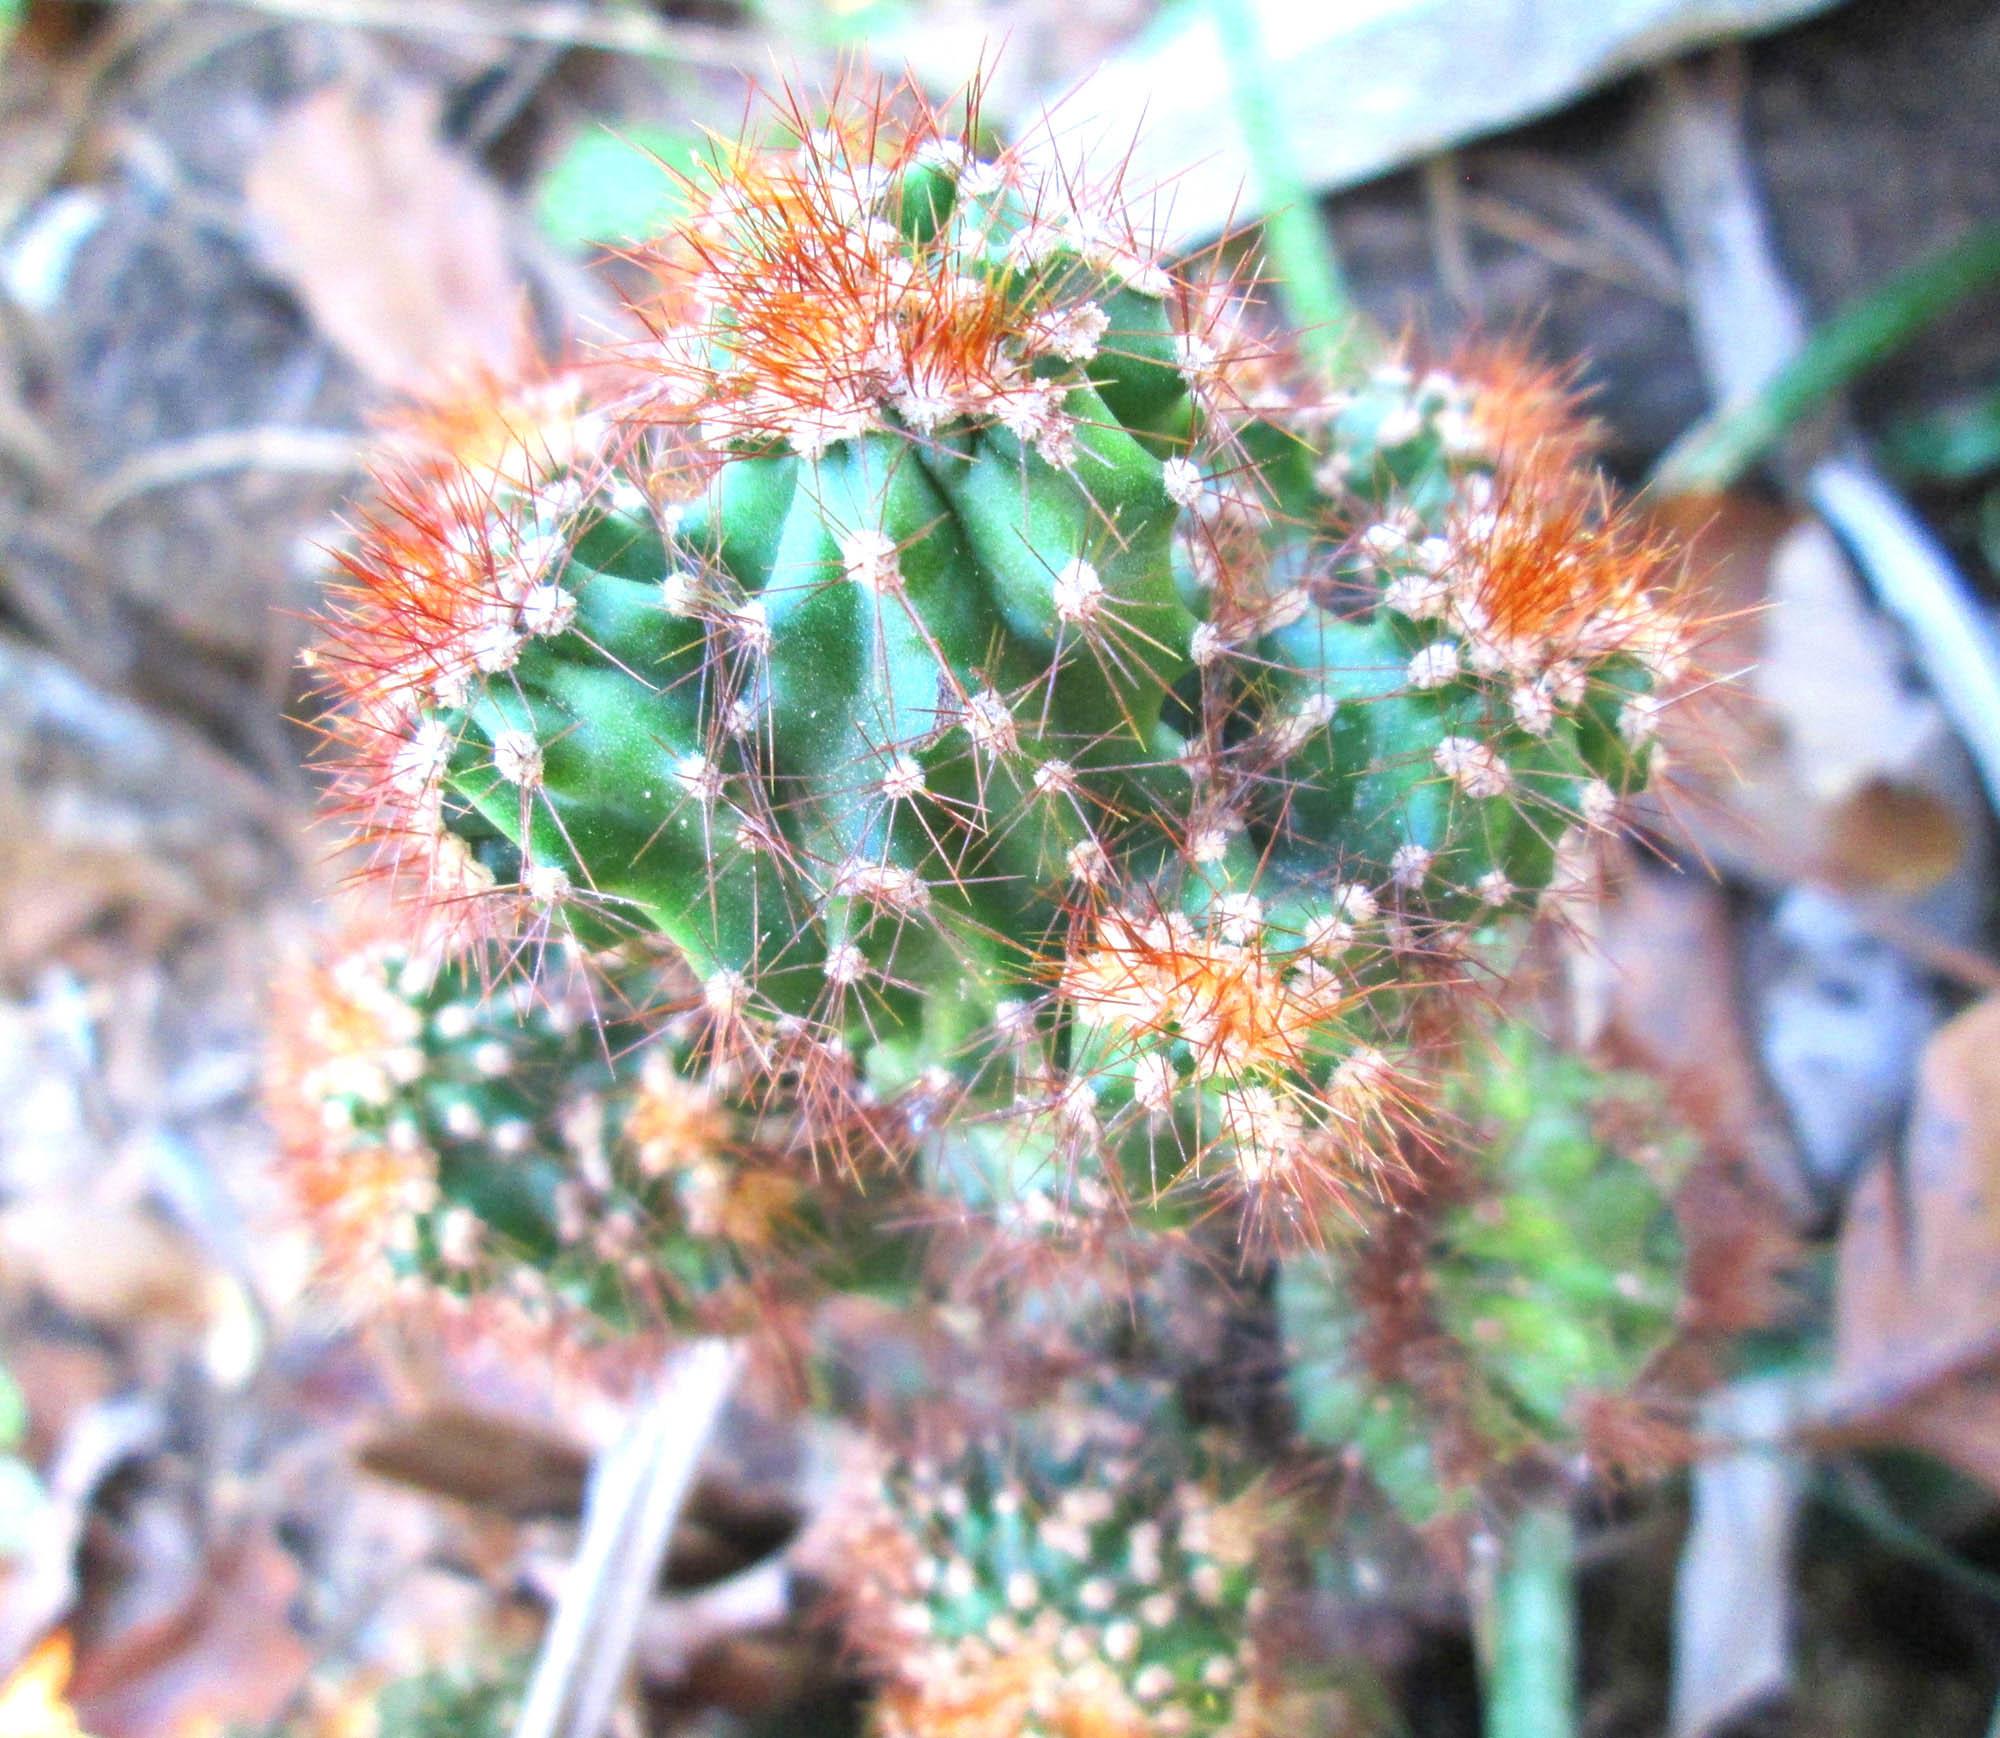 Cactus, Saguaro, West, Usa, Tree, HQ Photo